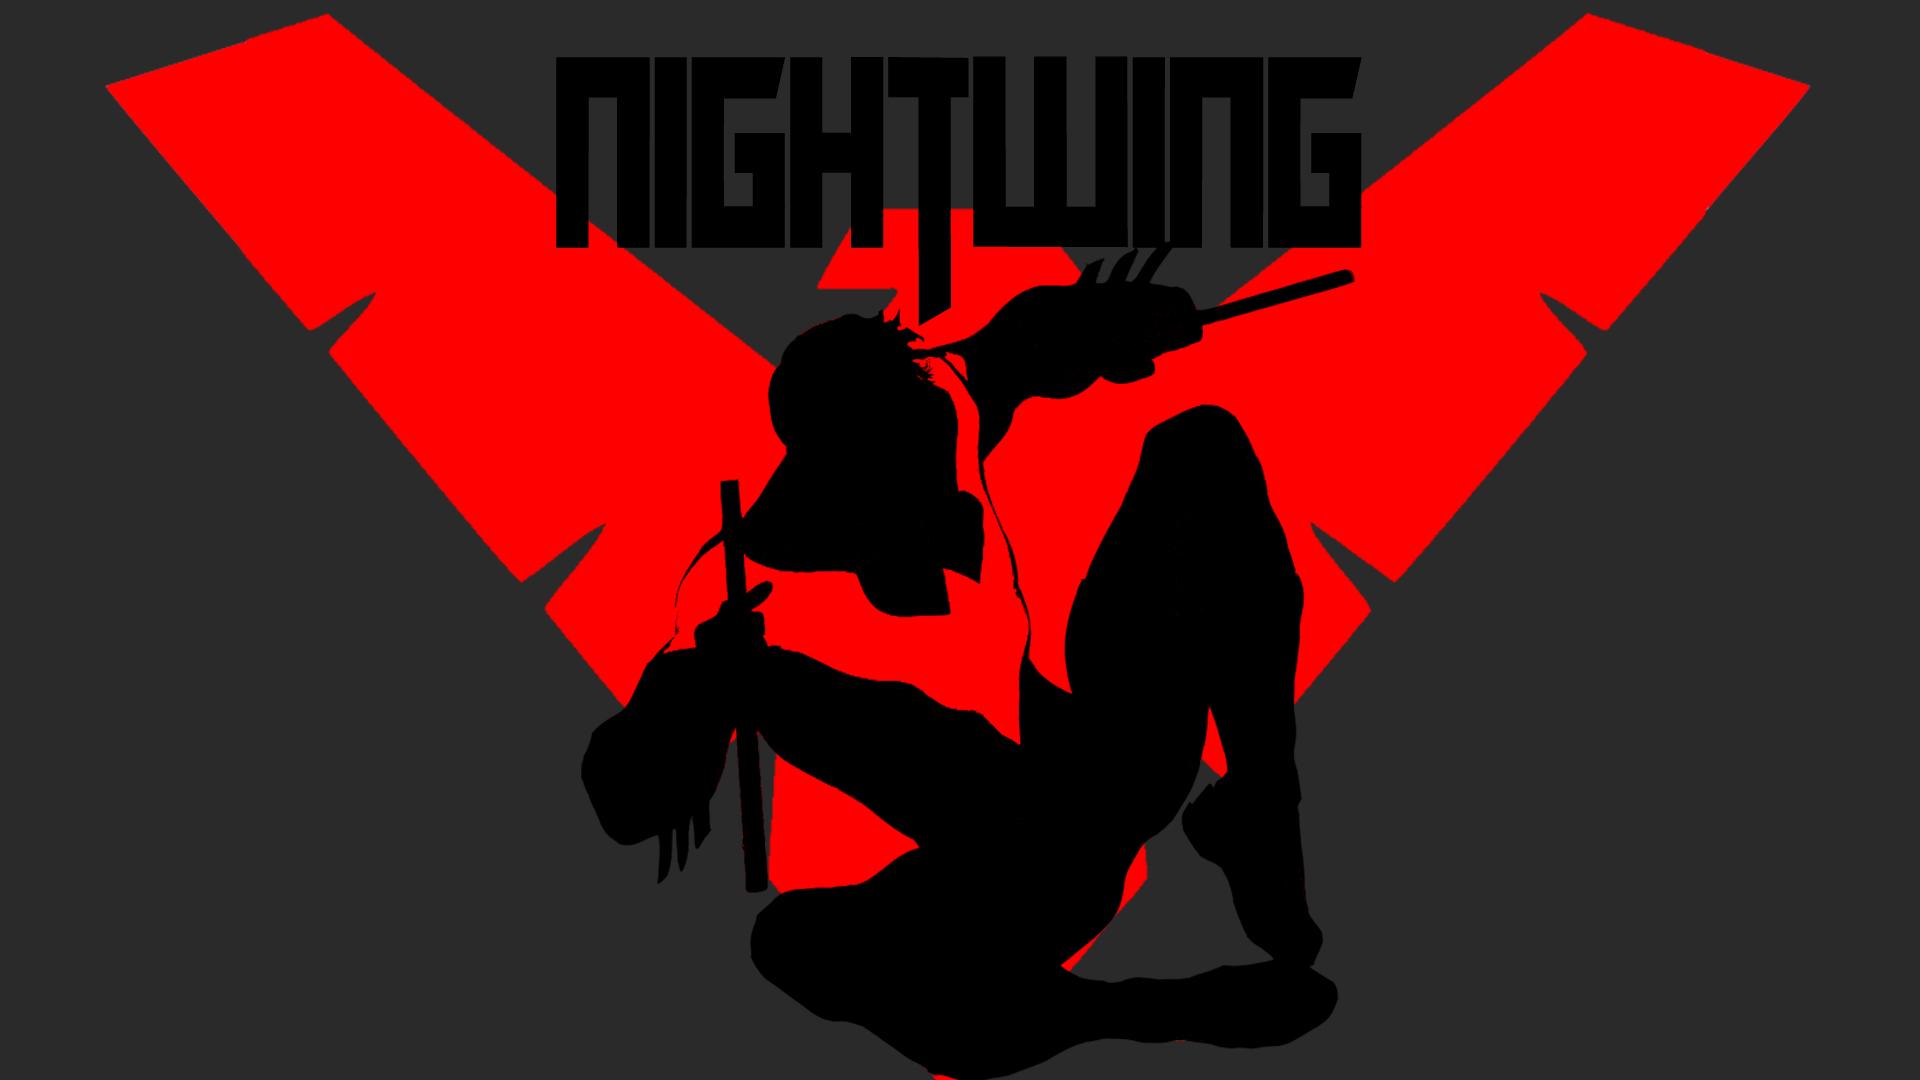 Desktop wallpapers pop art - Nightwing Symbol Wallpaper Nightwing Pop Art Wallpaper By